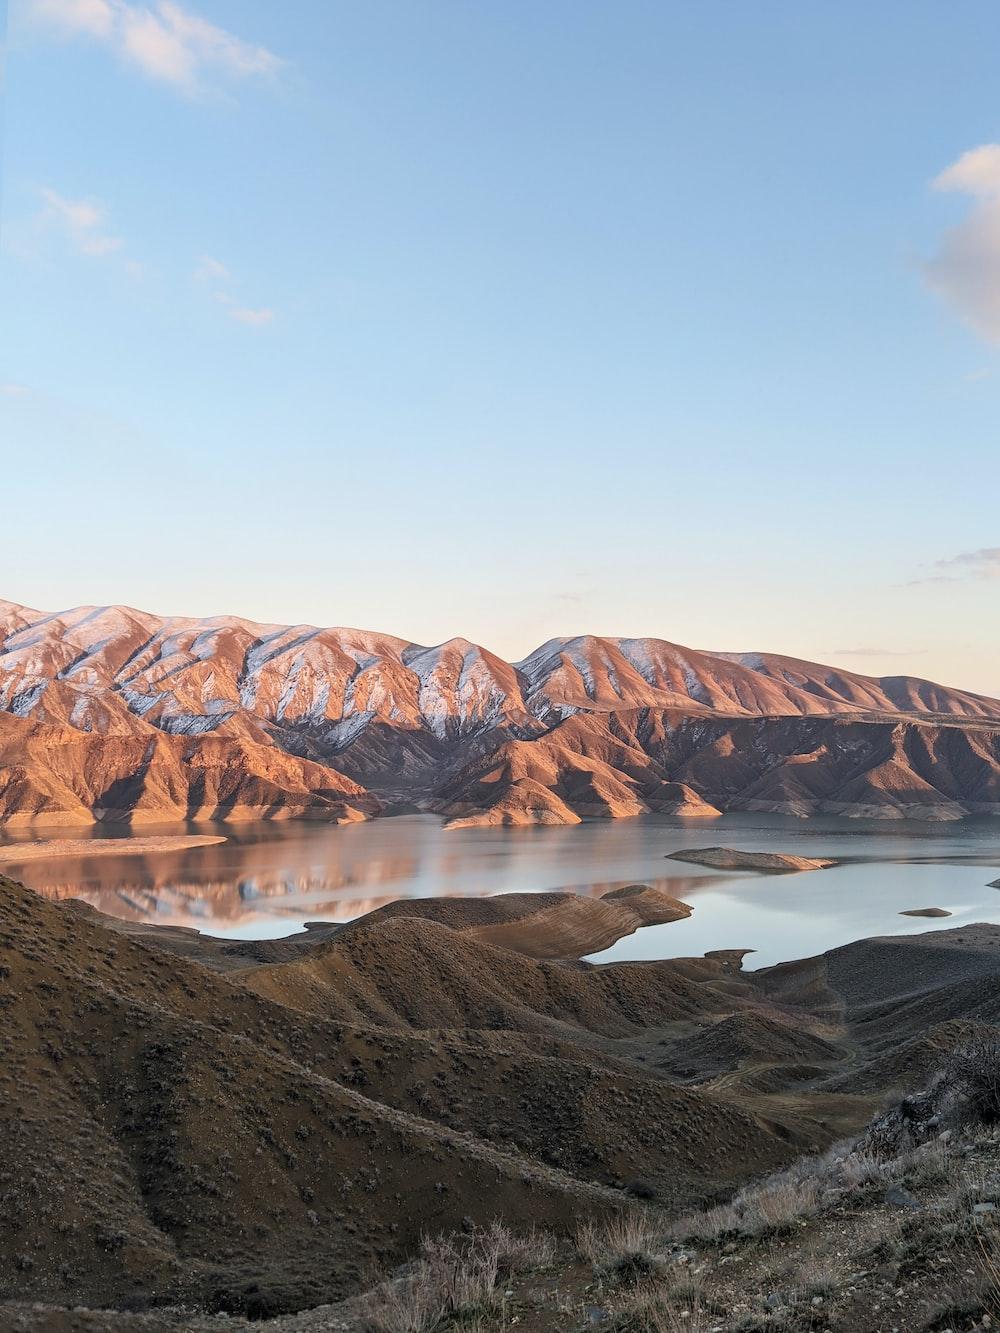 brown mountain near lake under blue sky during daytime